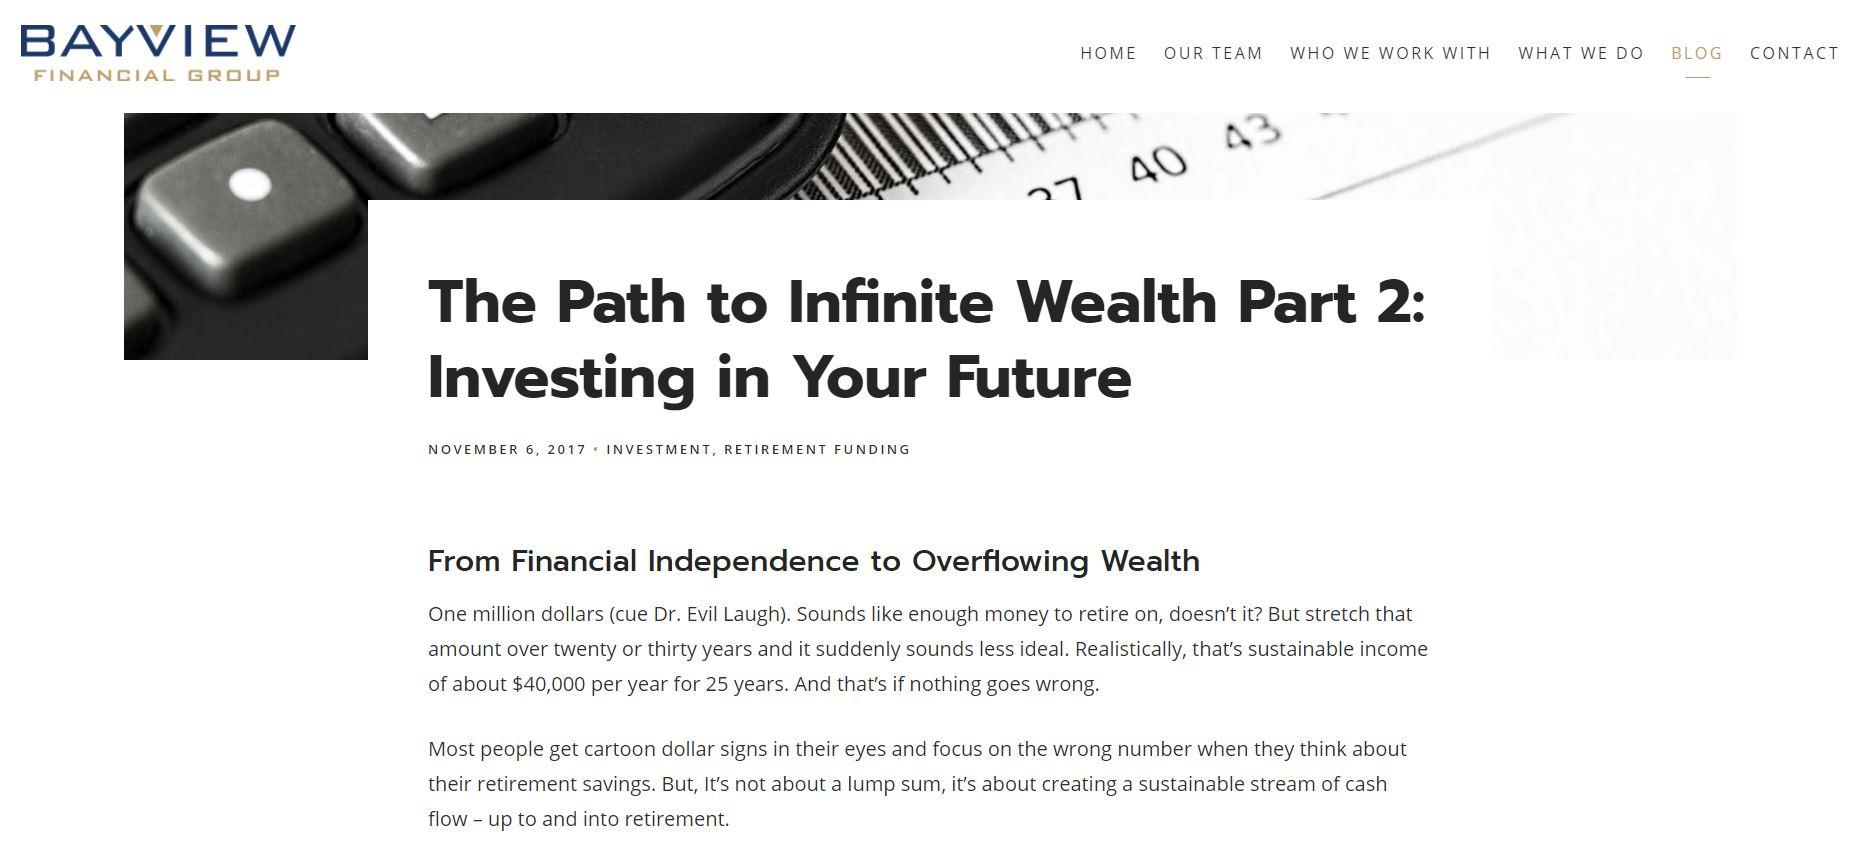 bayview financial group blog